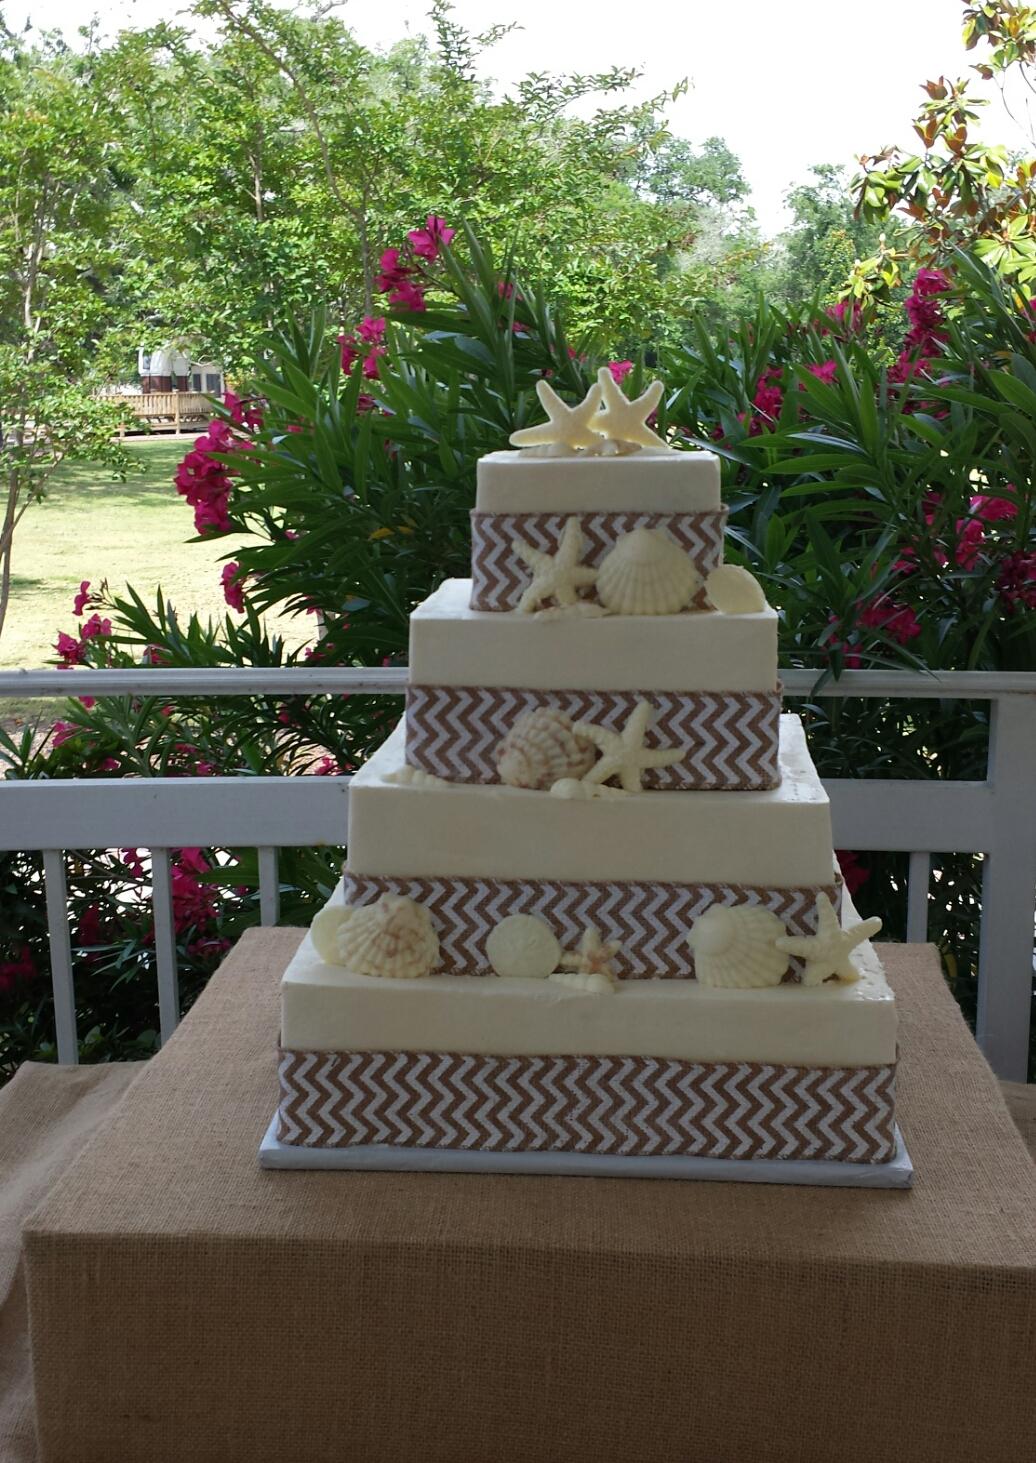 Roundtree cake